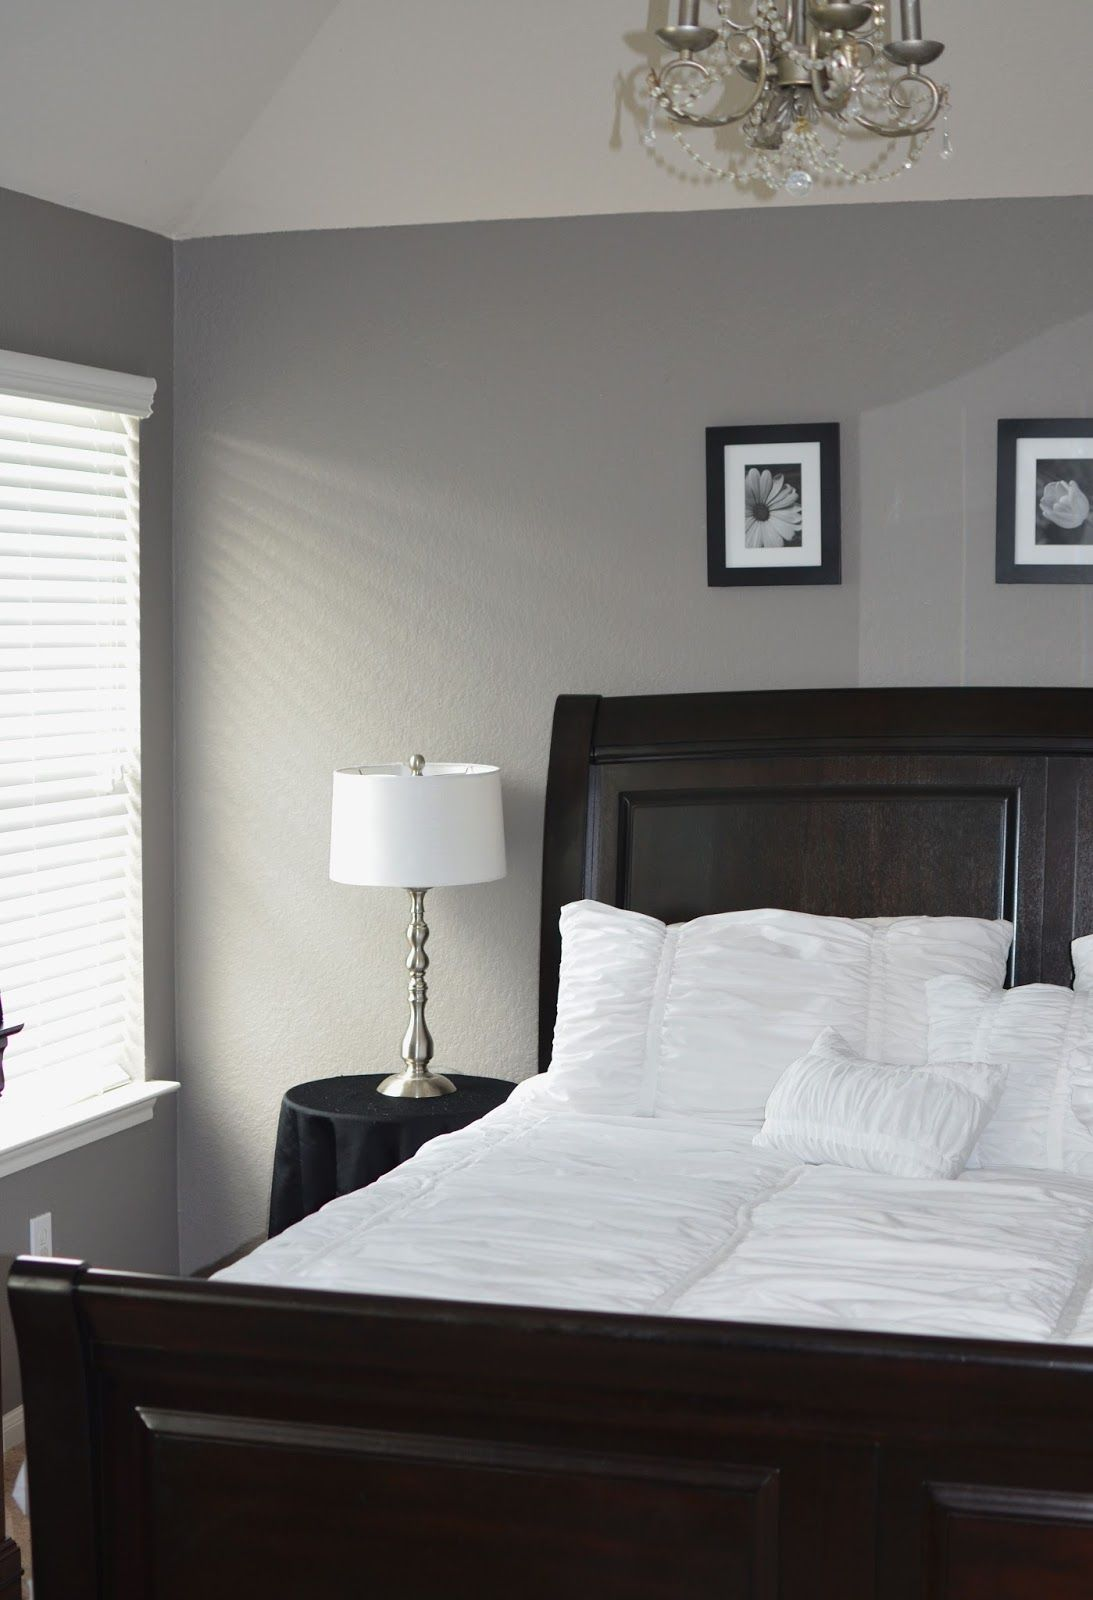 Our Master Bedroom Gray Master Bedroom Grey Bedroom Design